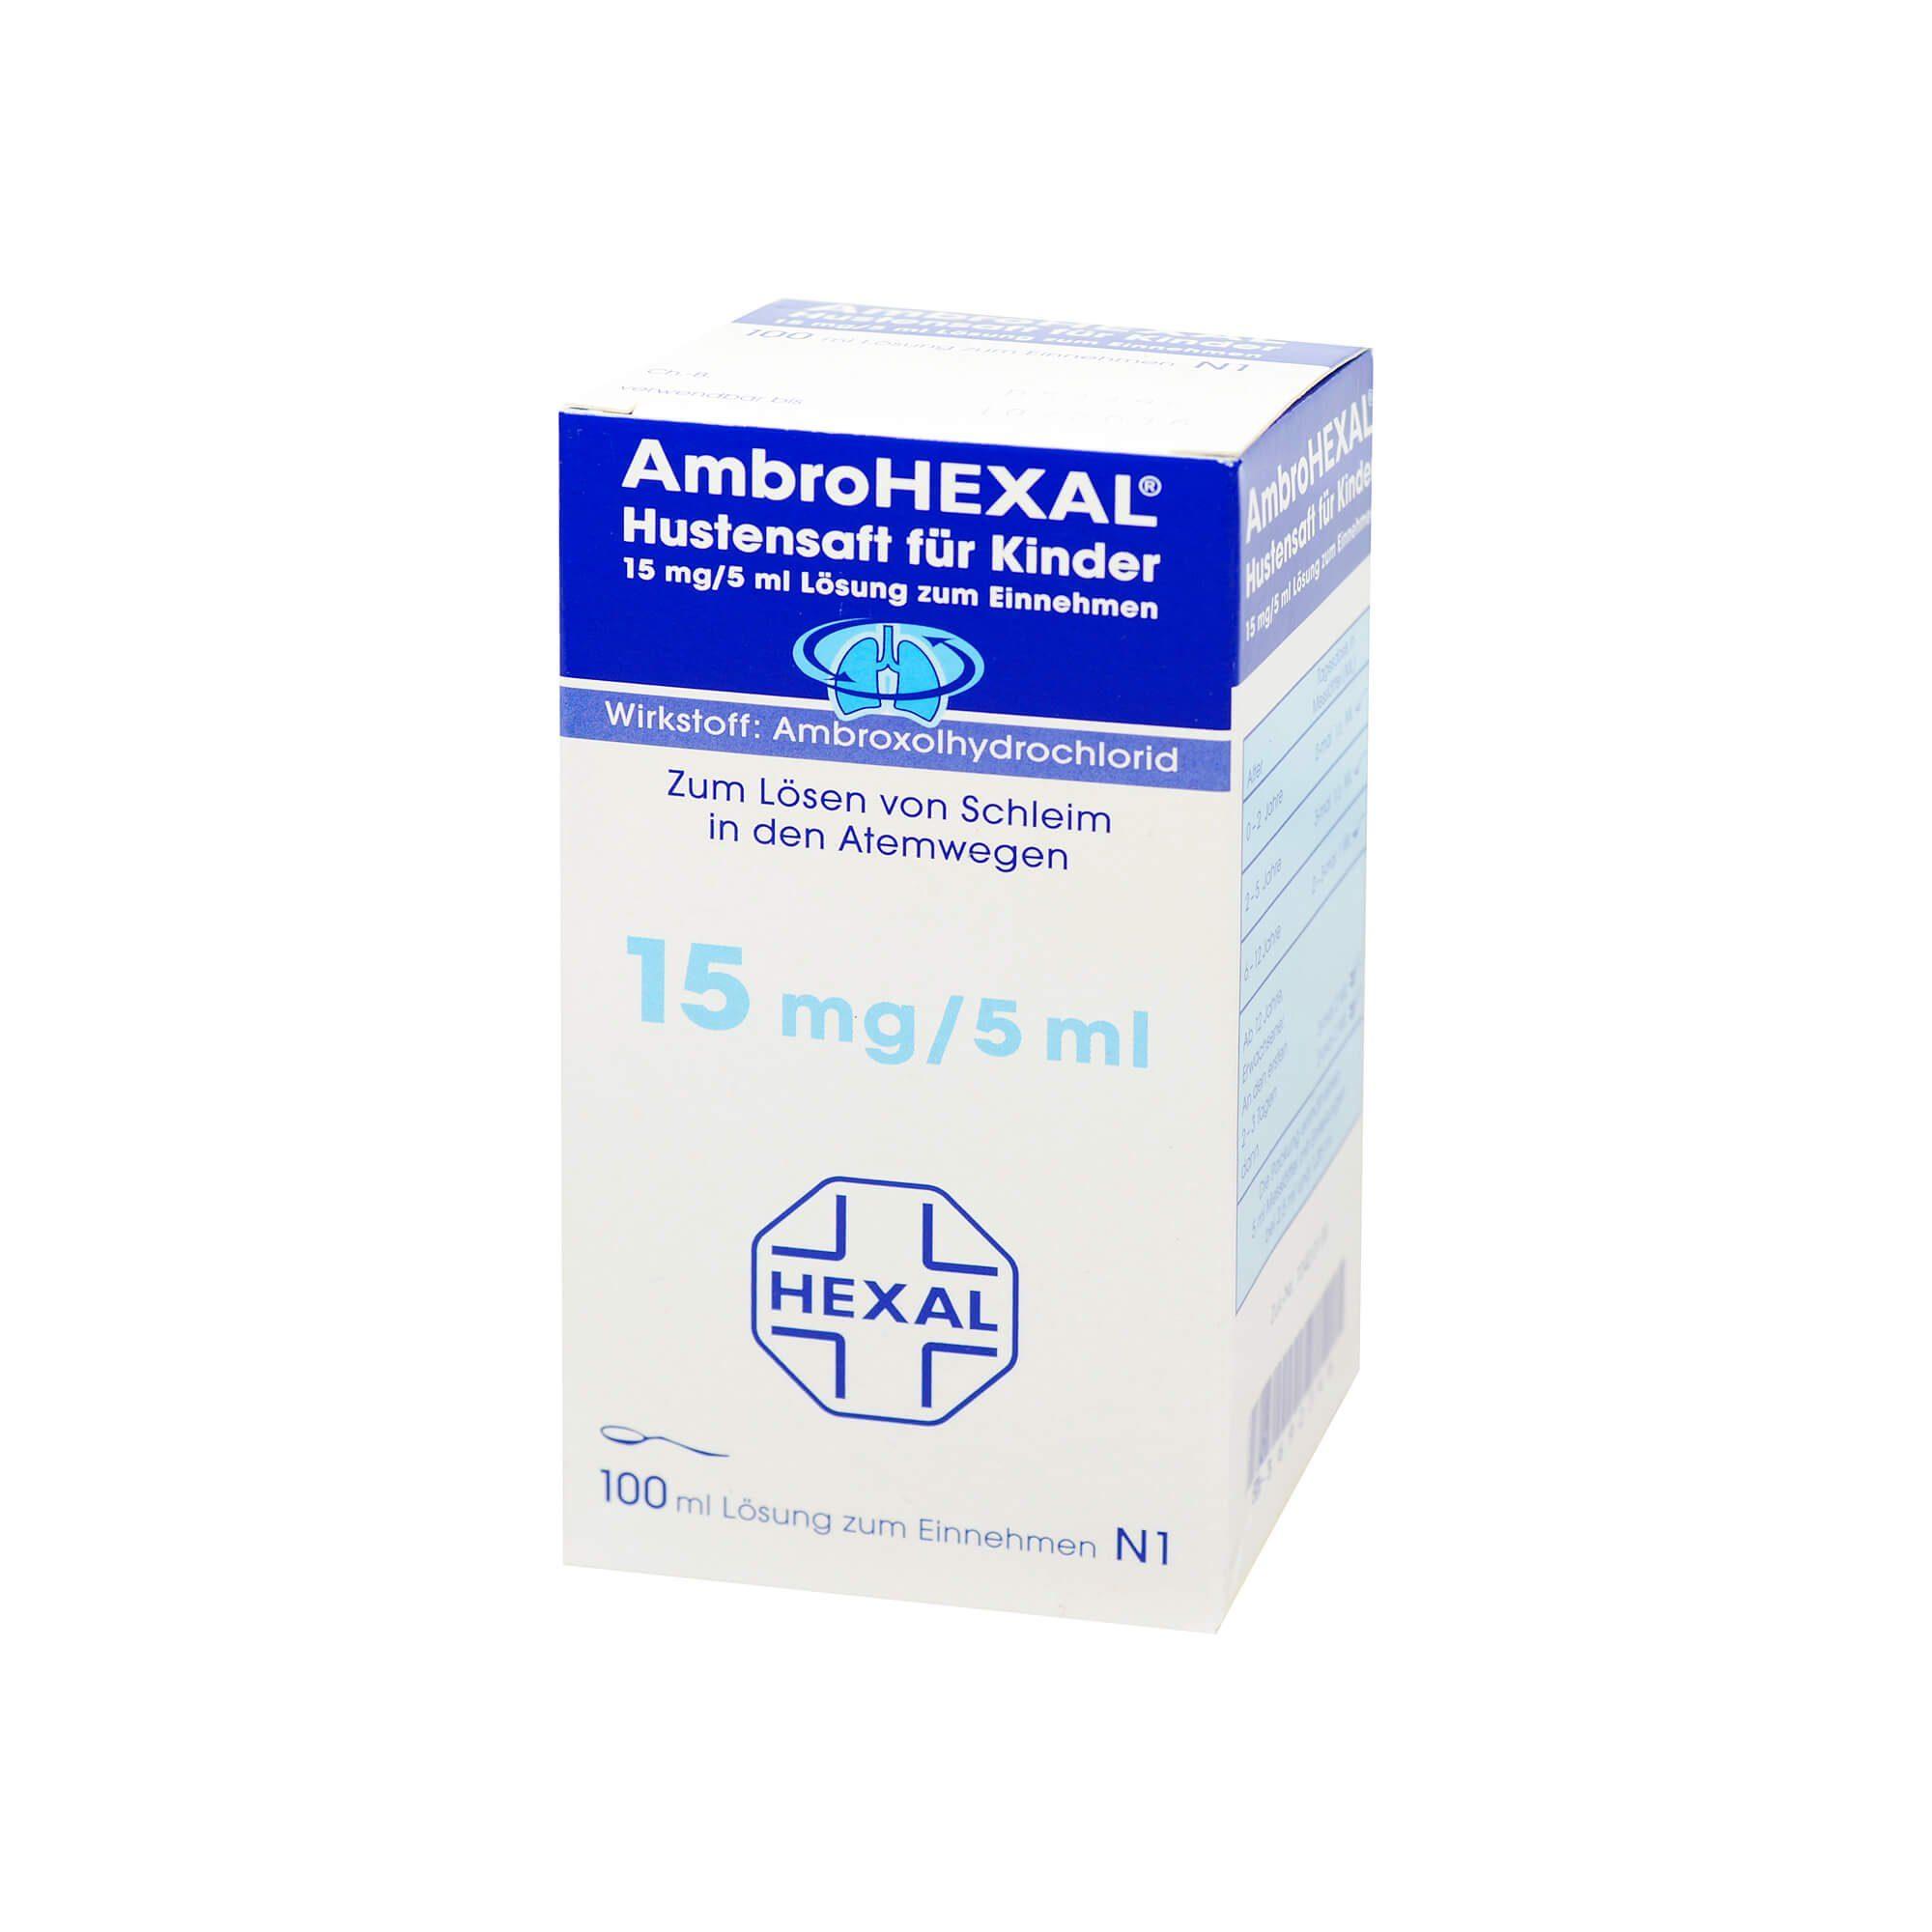 AmbroHEXAL Hustensaft Kinder , 100 ml